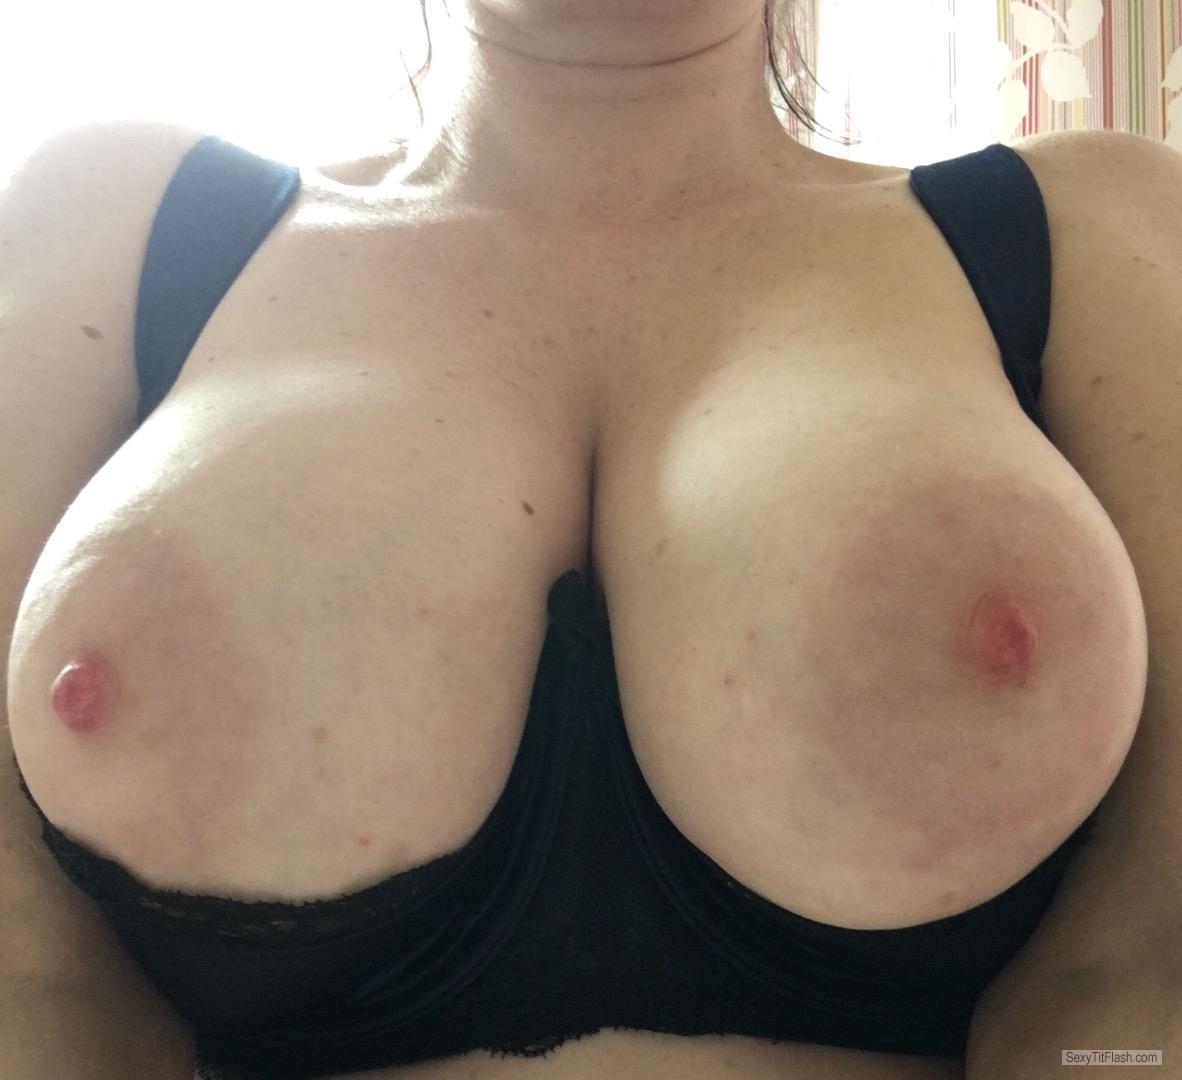 my big tits (selfie) - i ❤ shelf bras from united kingdom tit